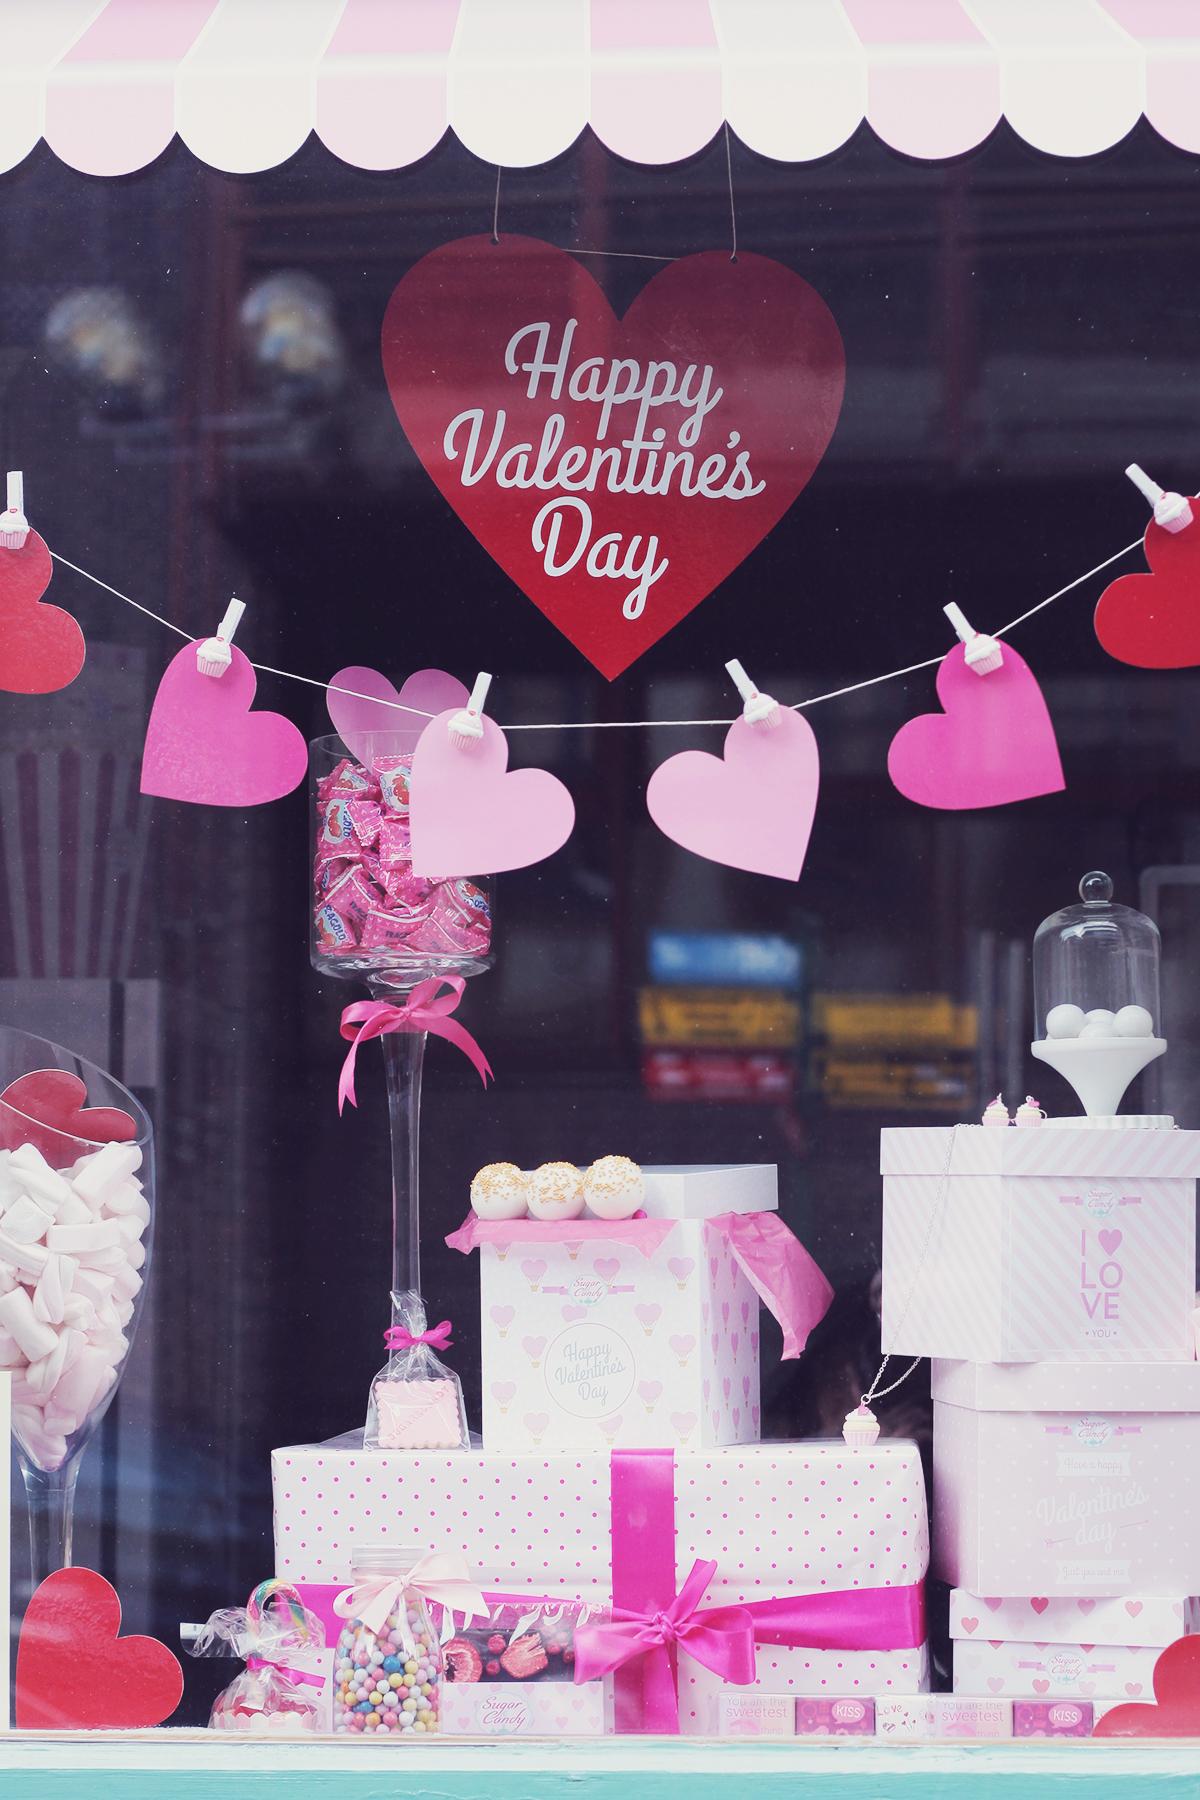 valentines day decorations - szeged hungary